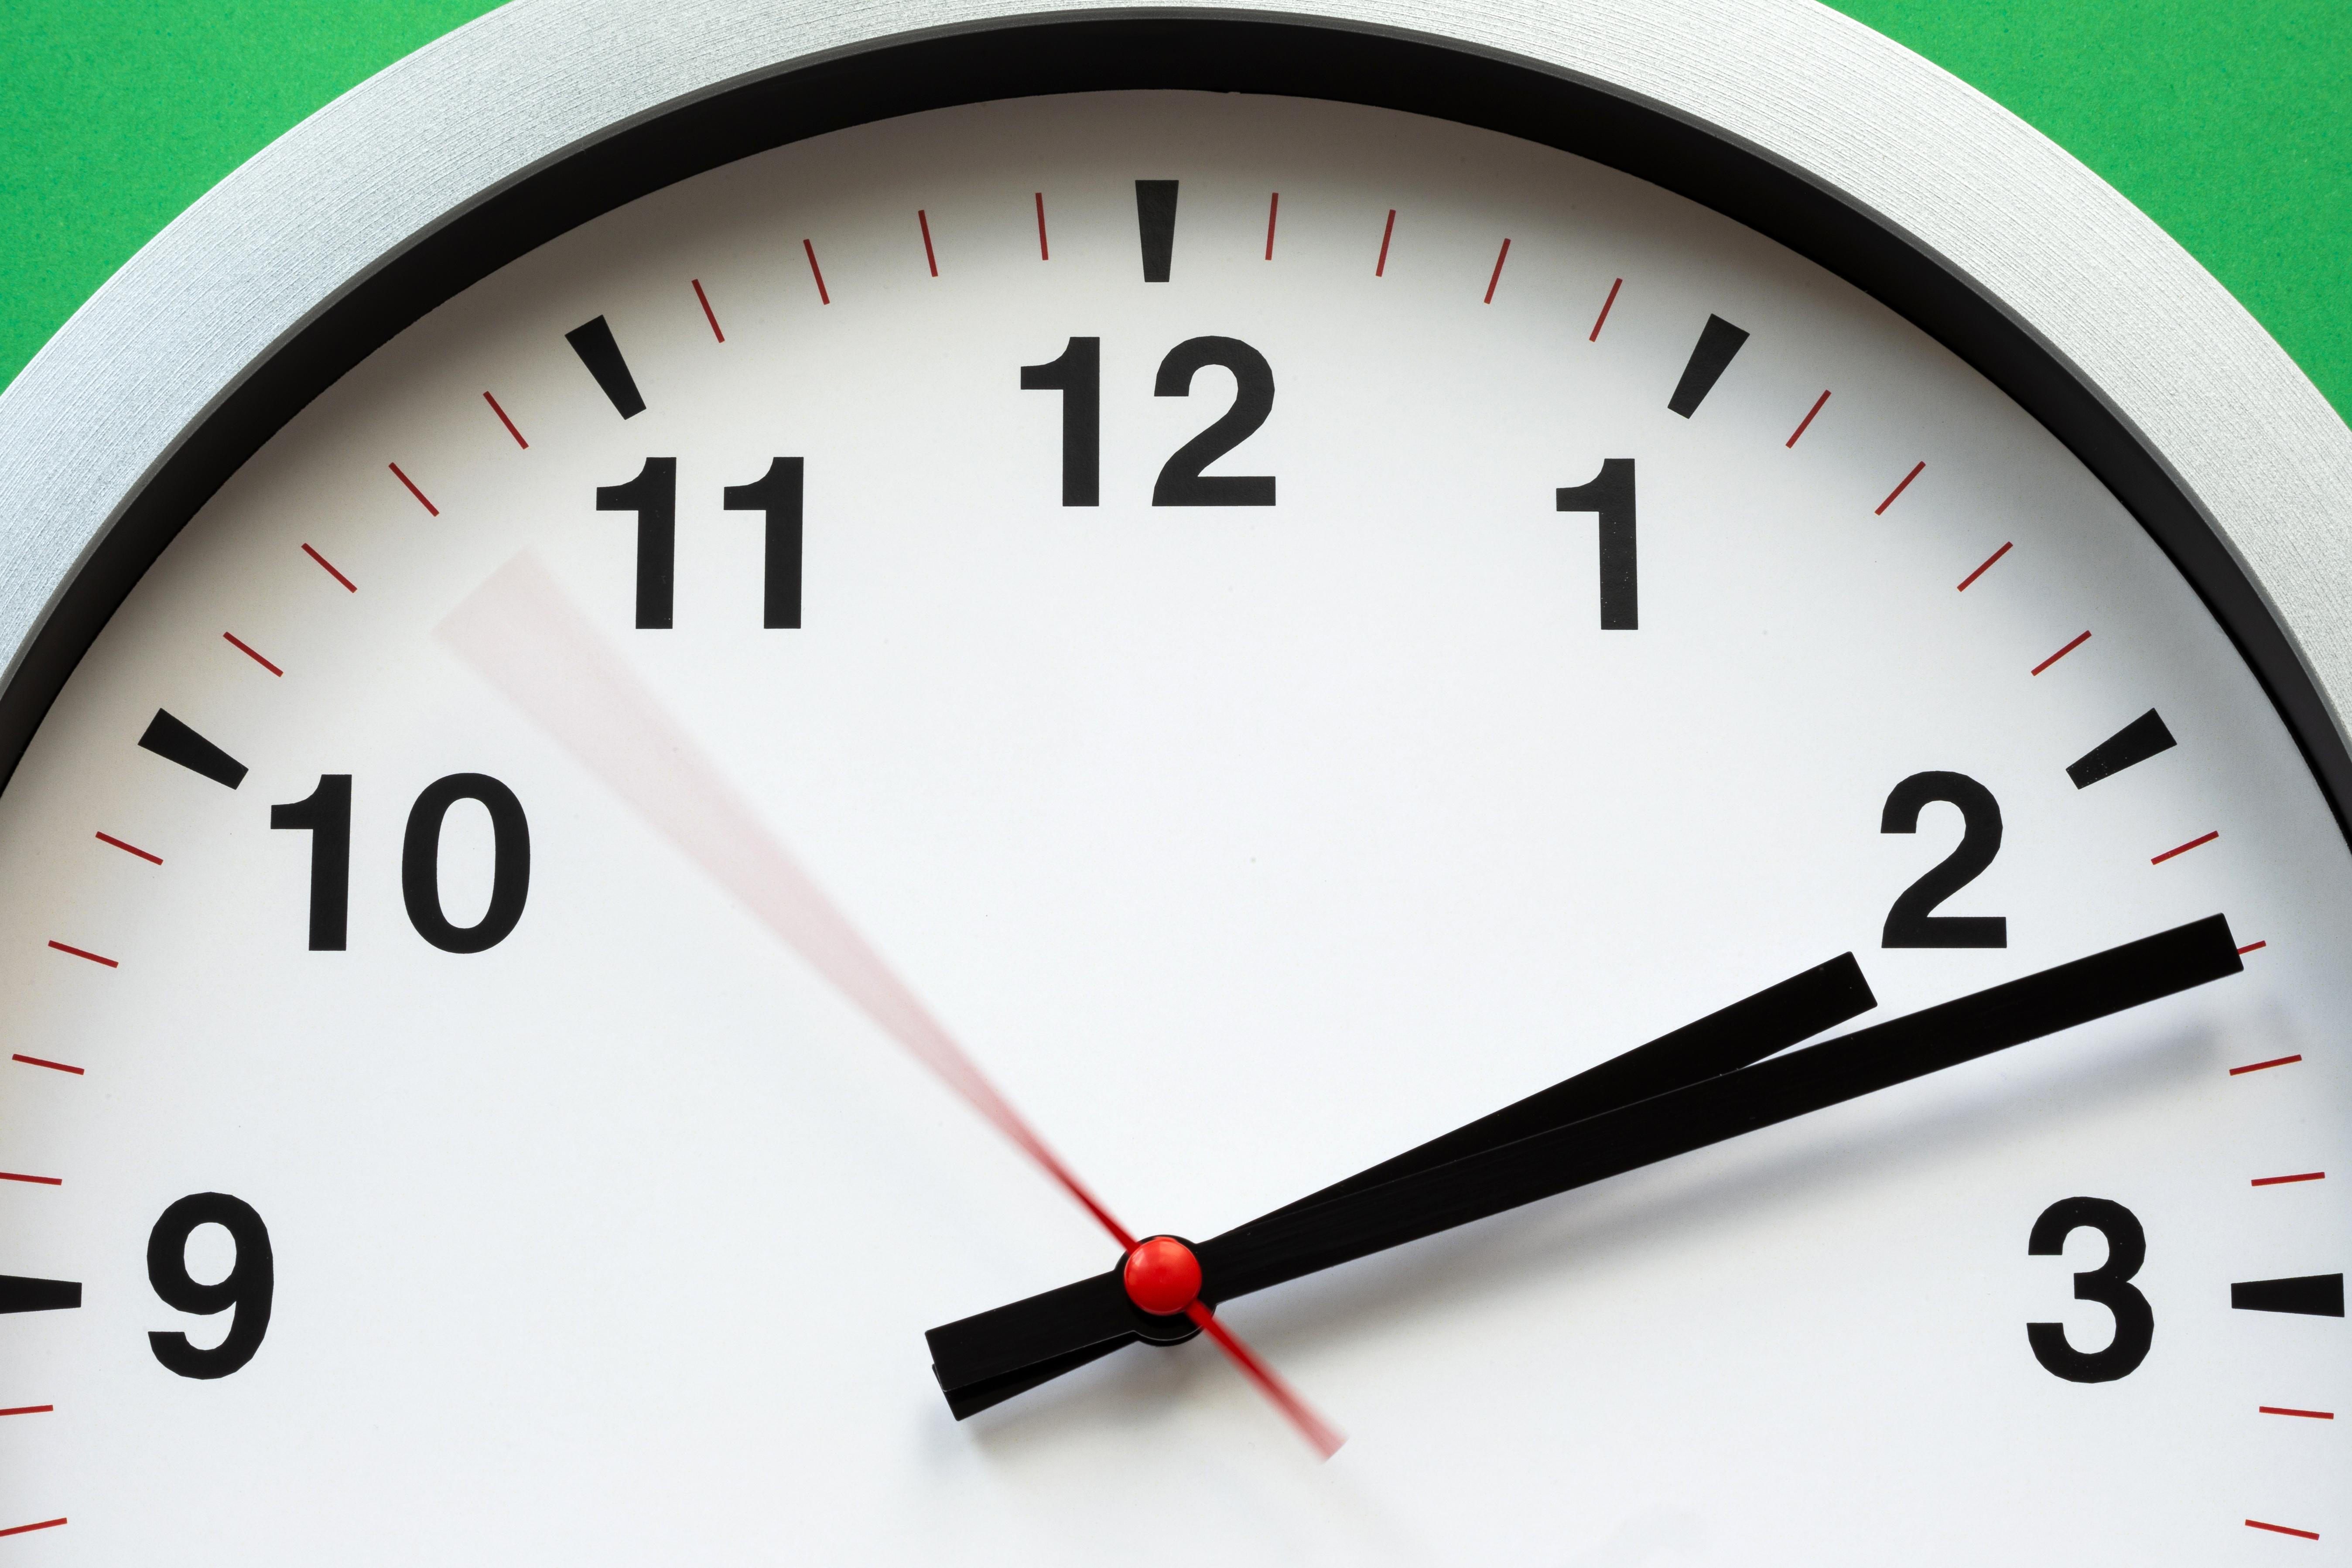 White Clock Reading at 2:12